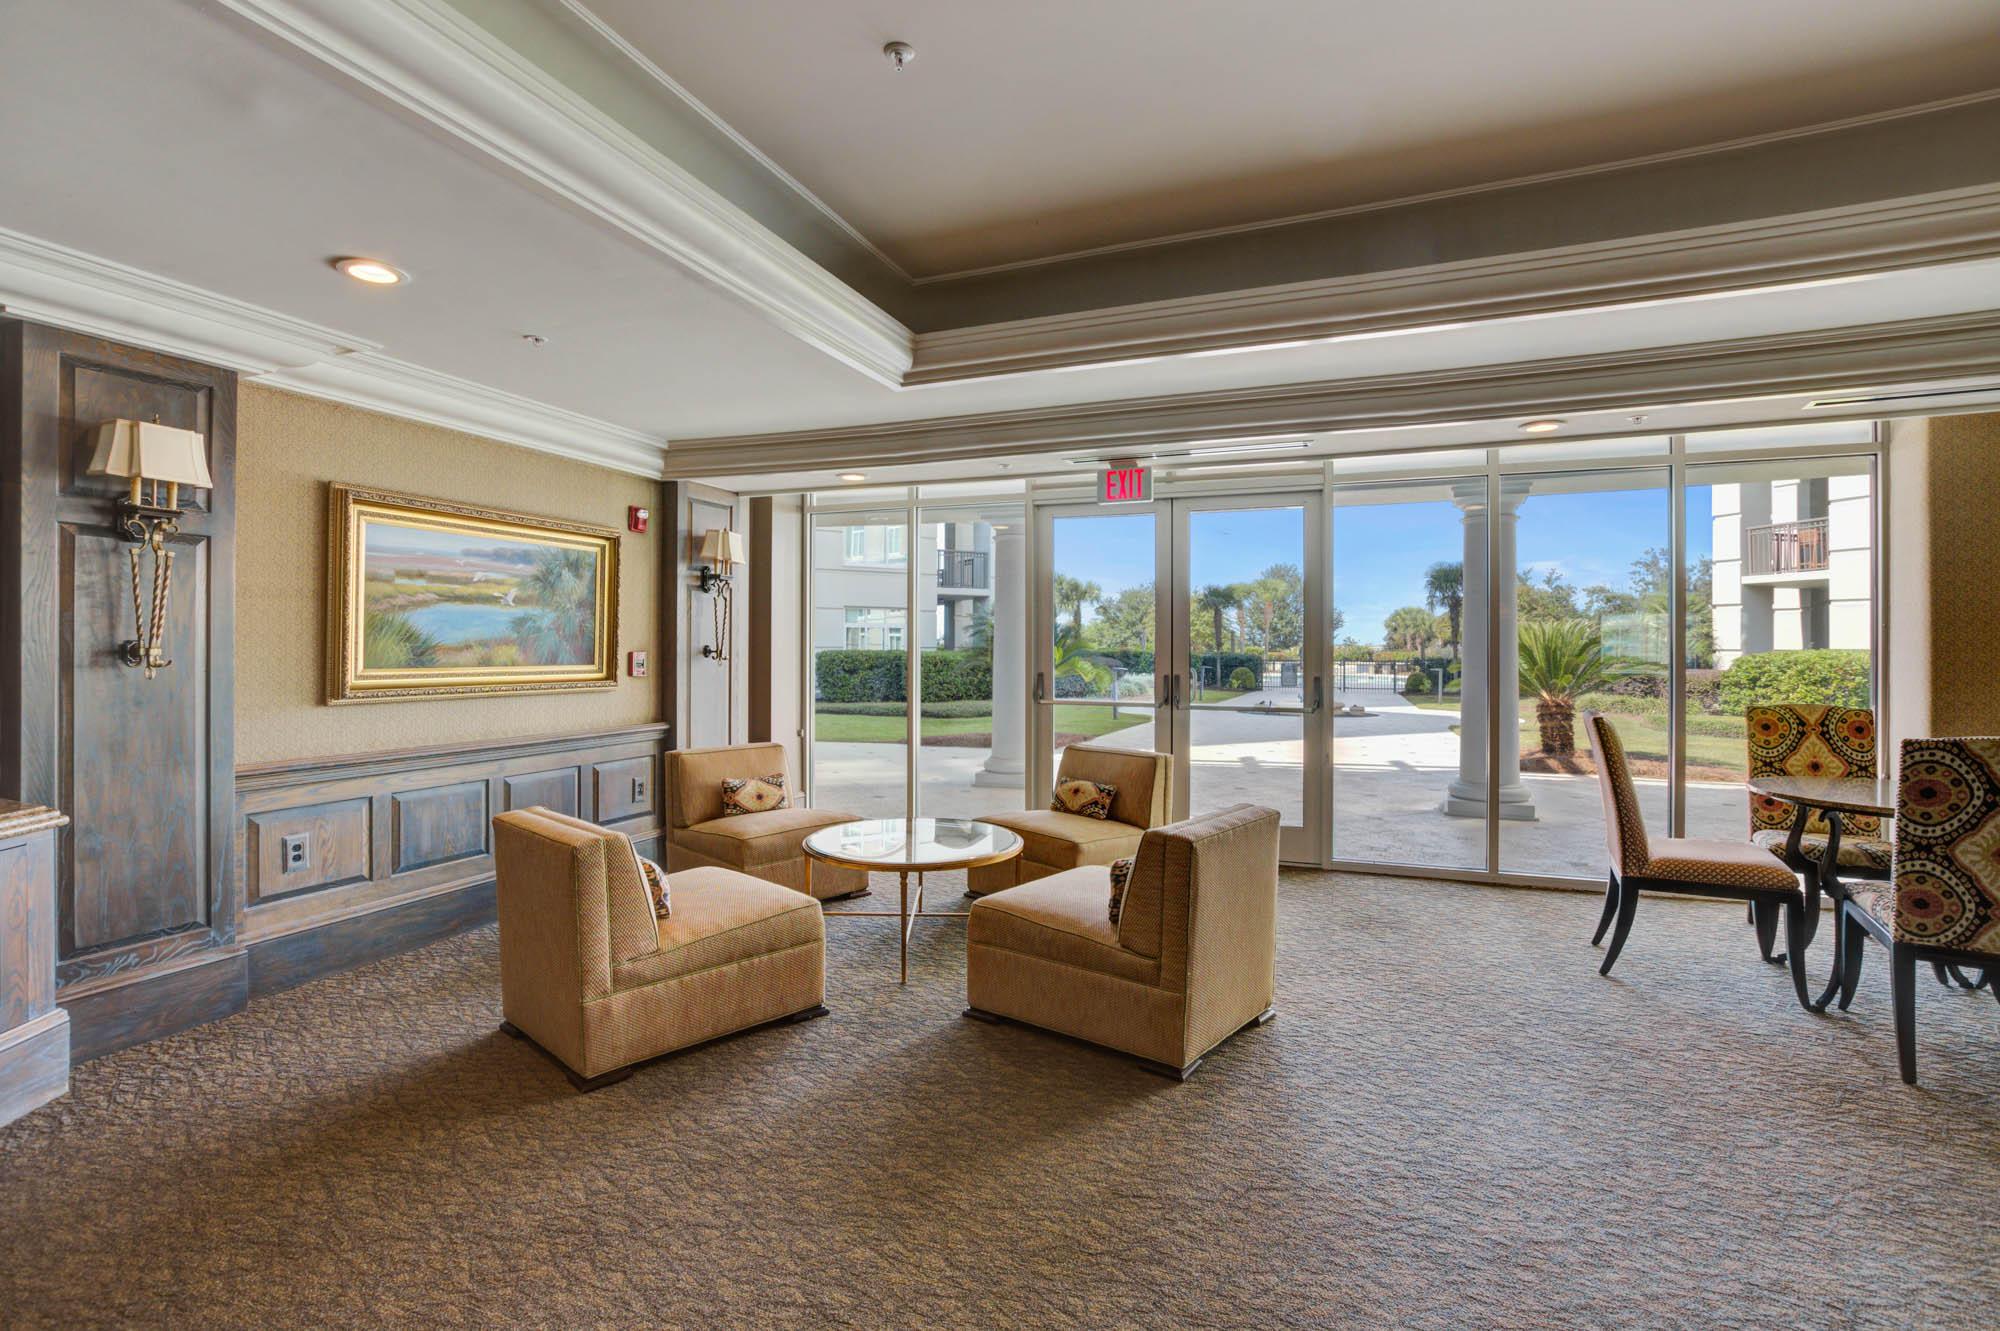 Renaissance On Chas Harbor Homes For Sale - 125 Plaza, Mount Pleasant, SC - 11